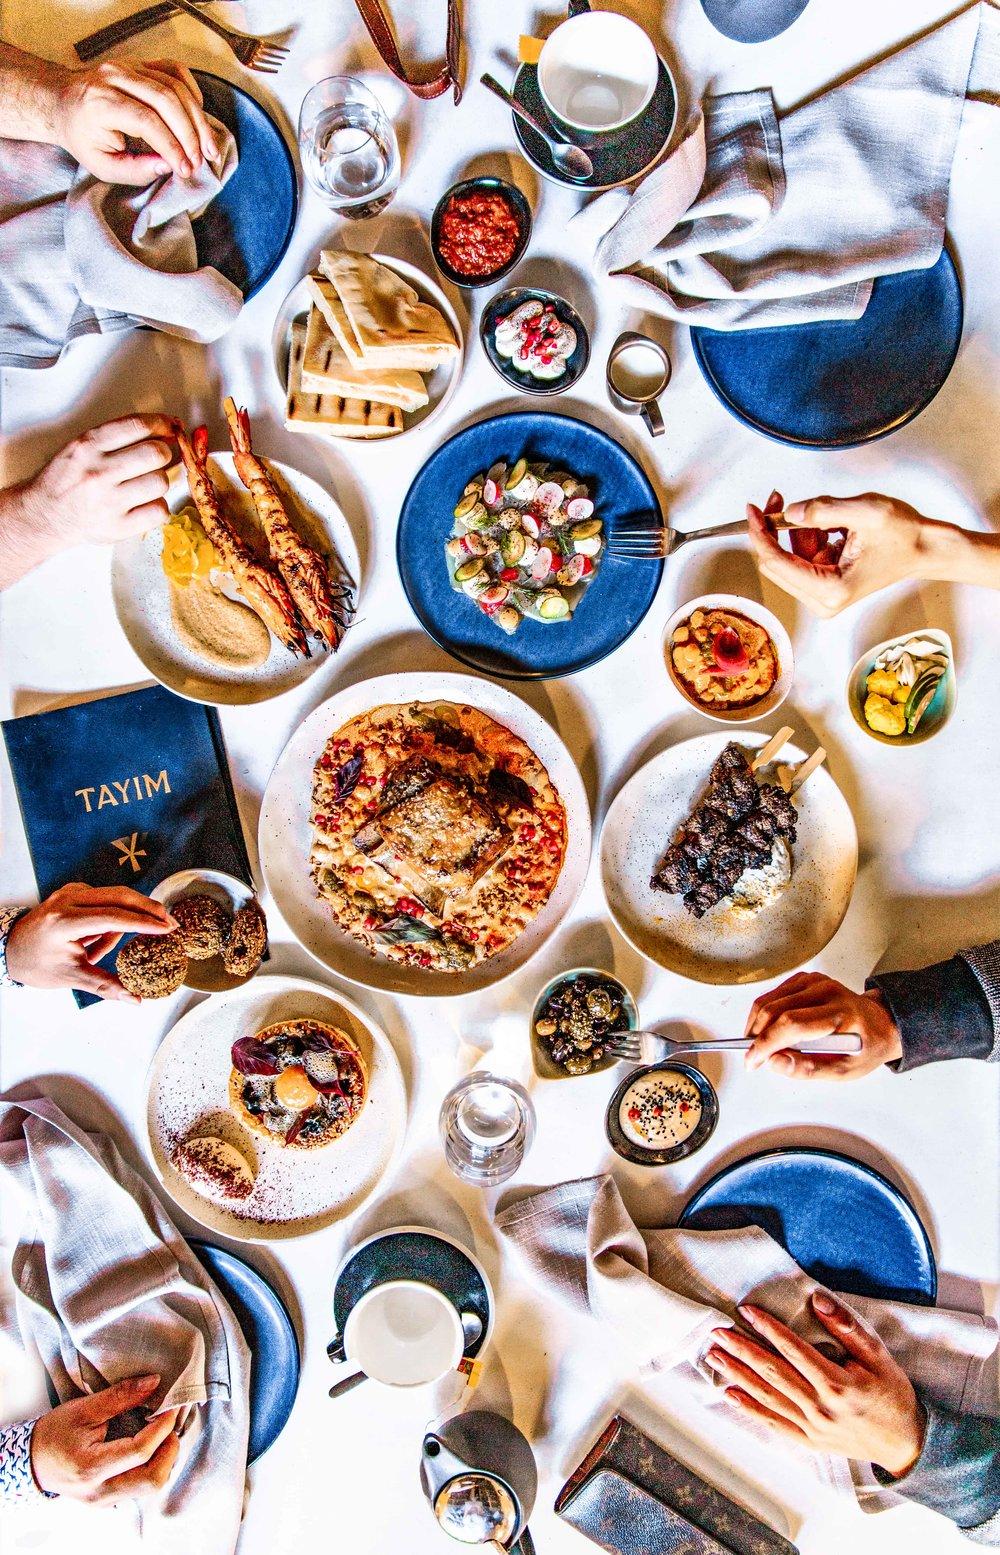 Tayim: Australian Cuisine with a Middle Eastern Cuisine twist flatlay